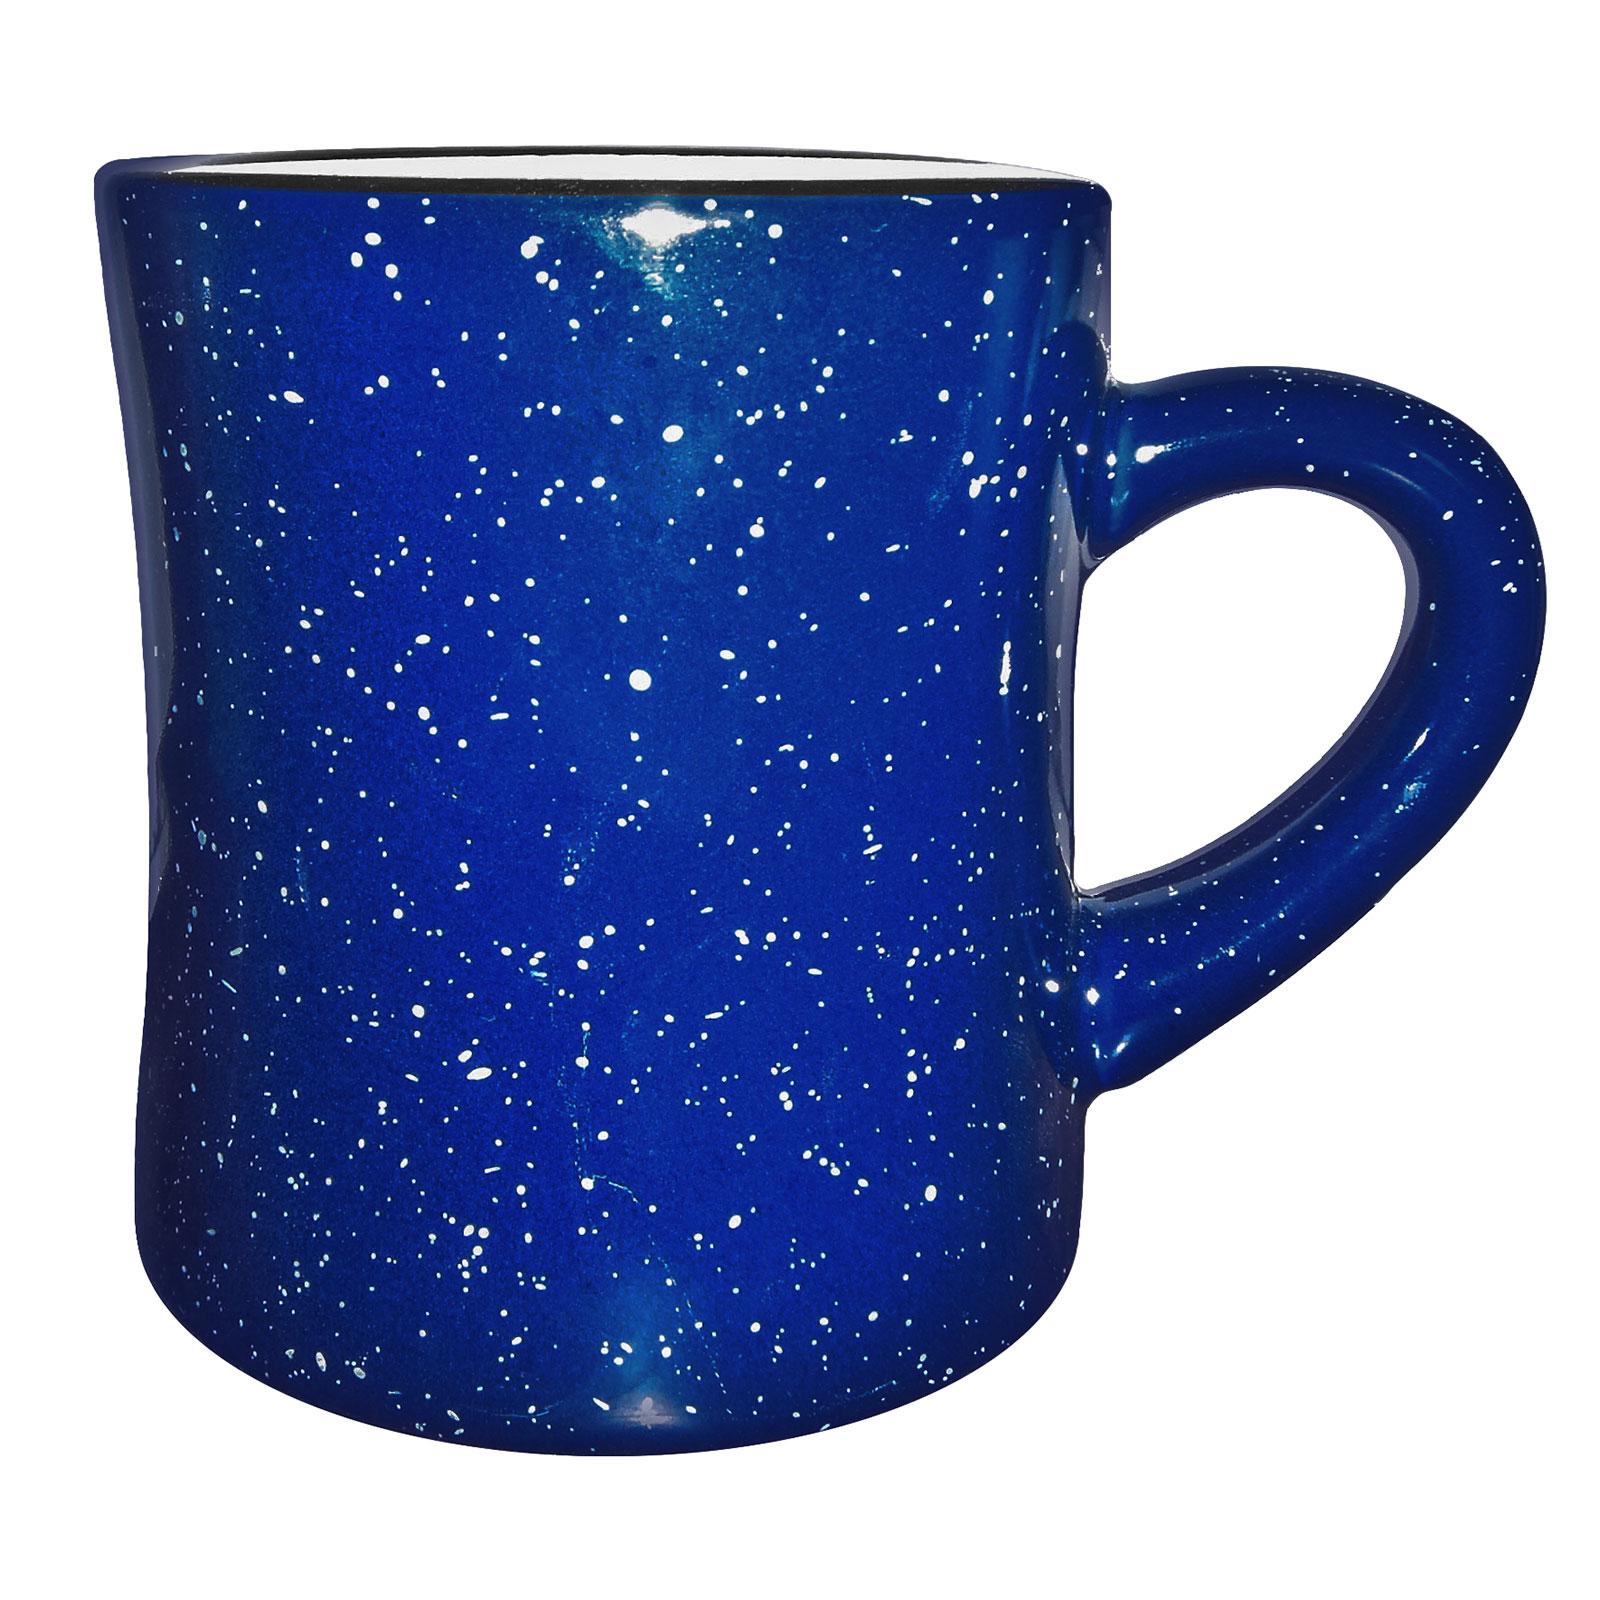 International Tableware 82245-02/04 mug, china